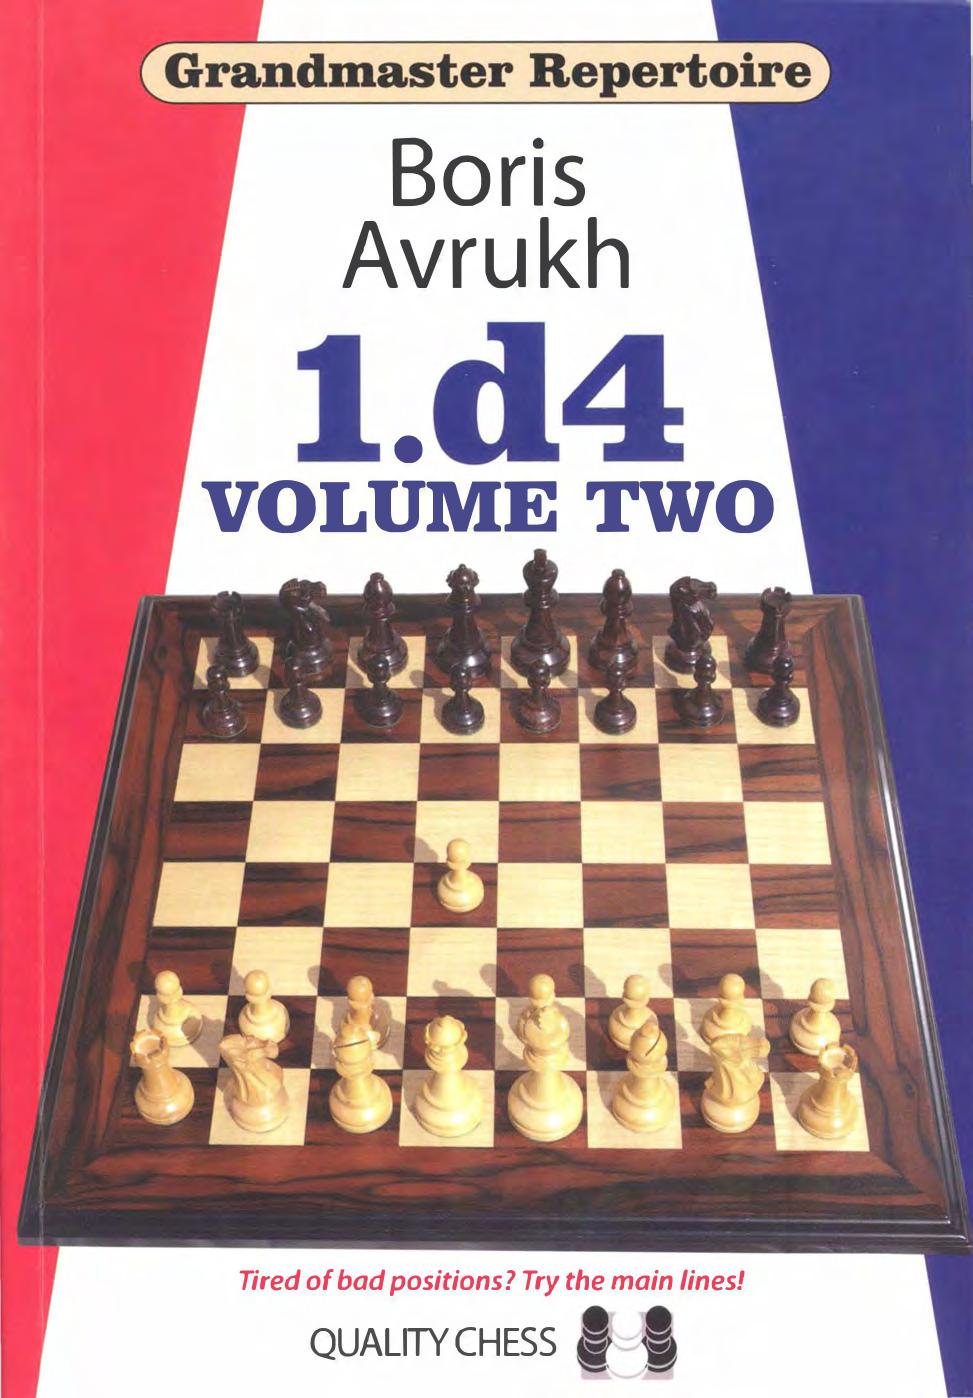 Grandmaster Repertoire 2 d4 vol 2